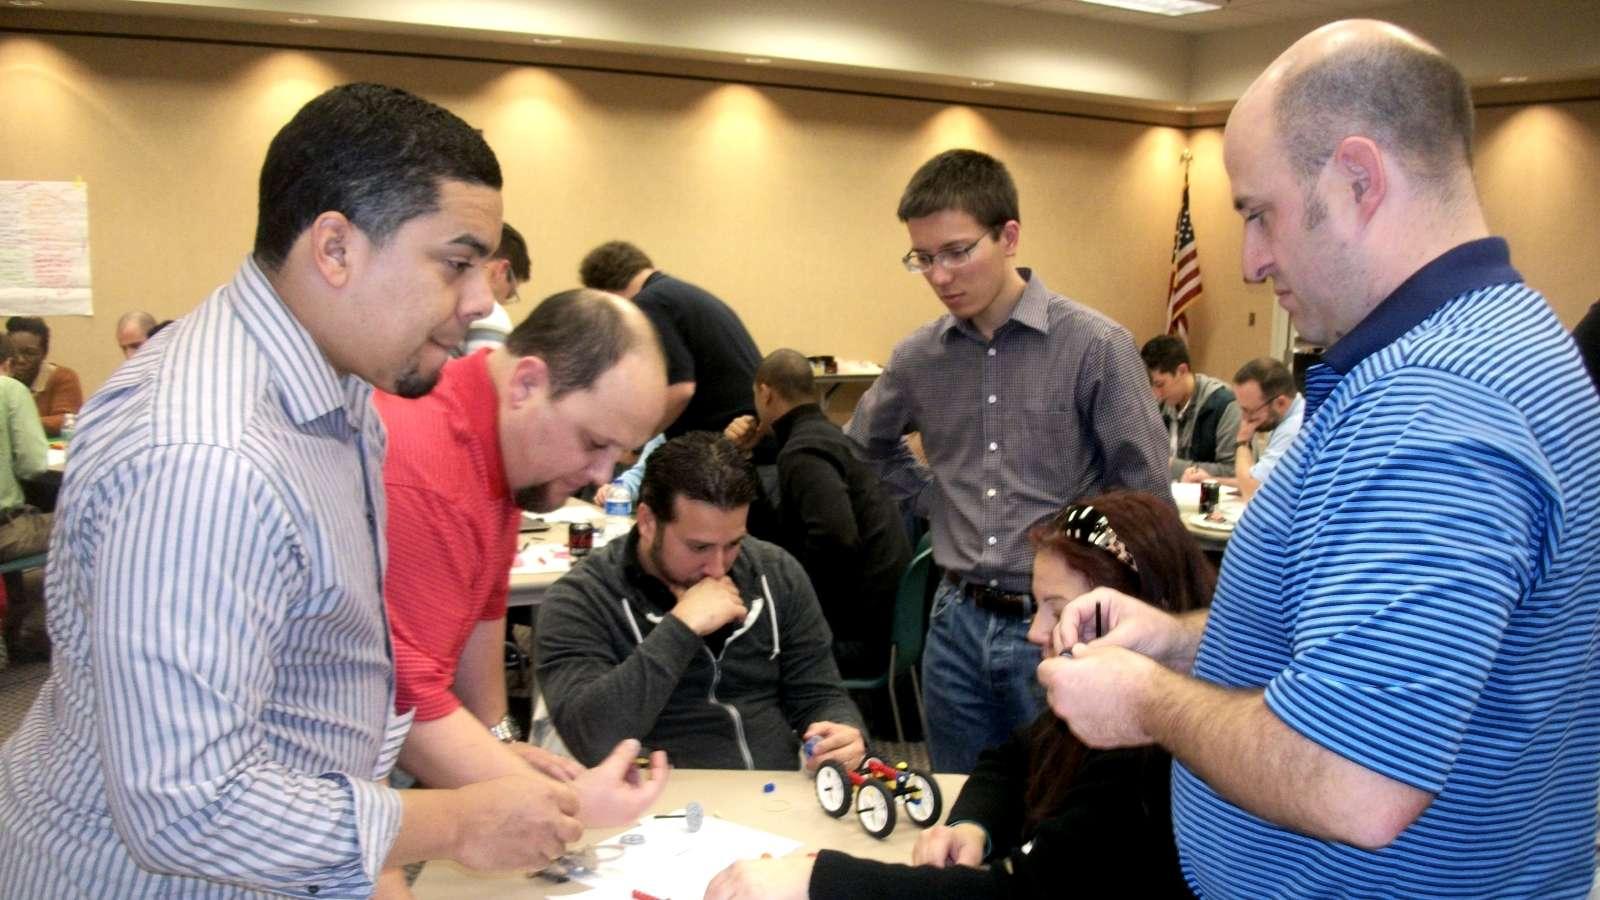 Interactive team building-Hands-on teamwork challenge